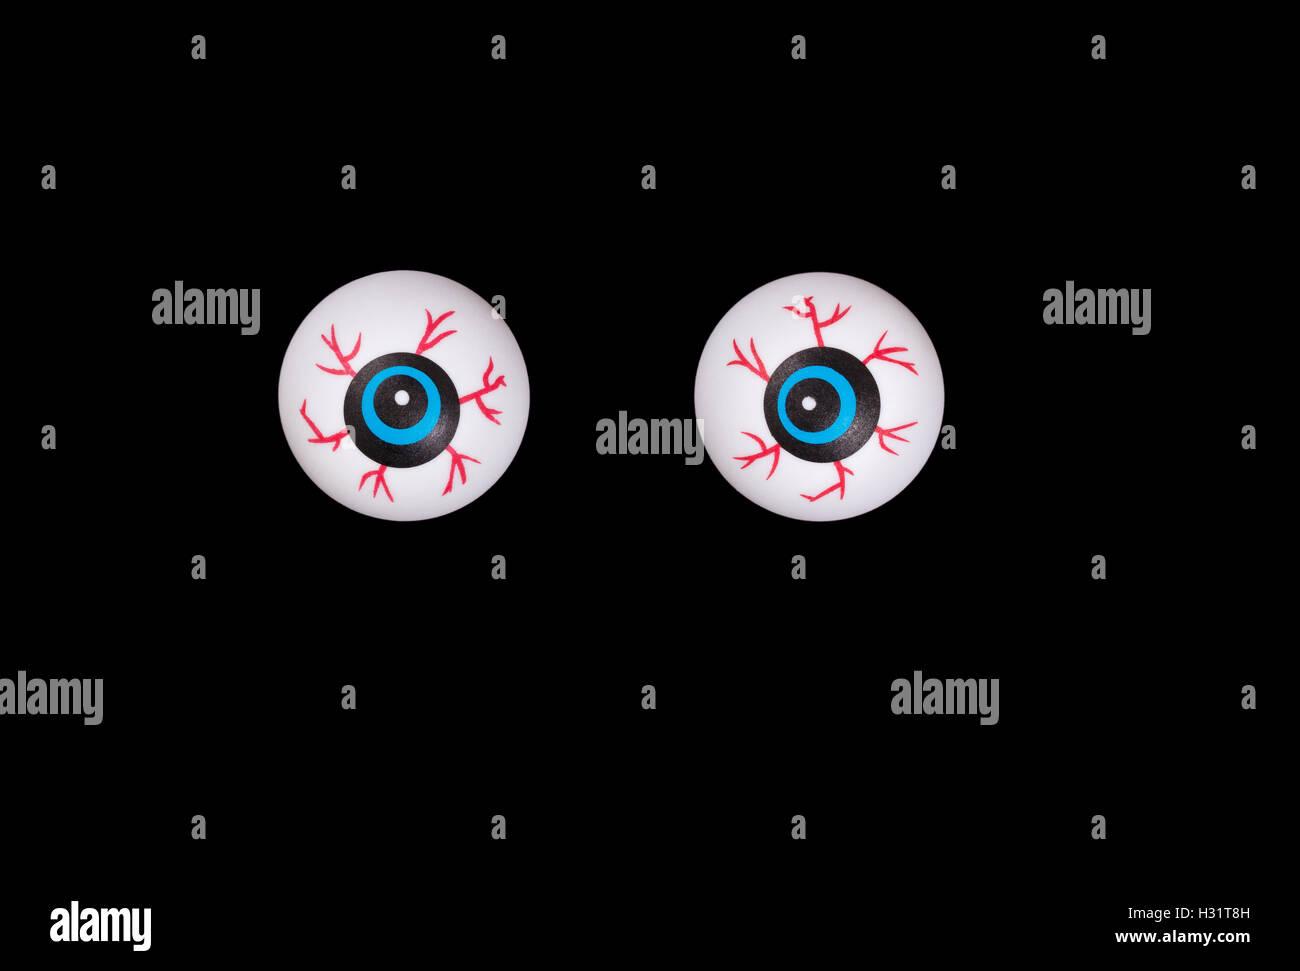 Scary eyeballs for Halloween season isolated on black background. - Stock Image